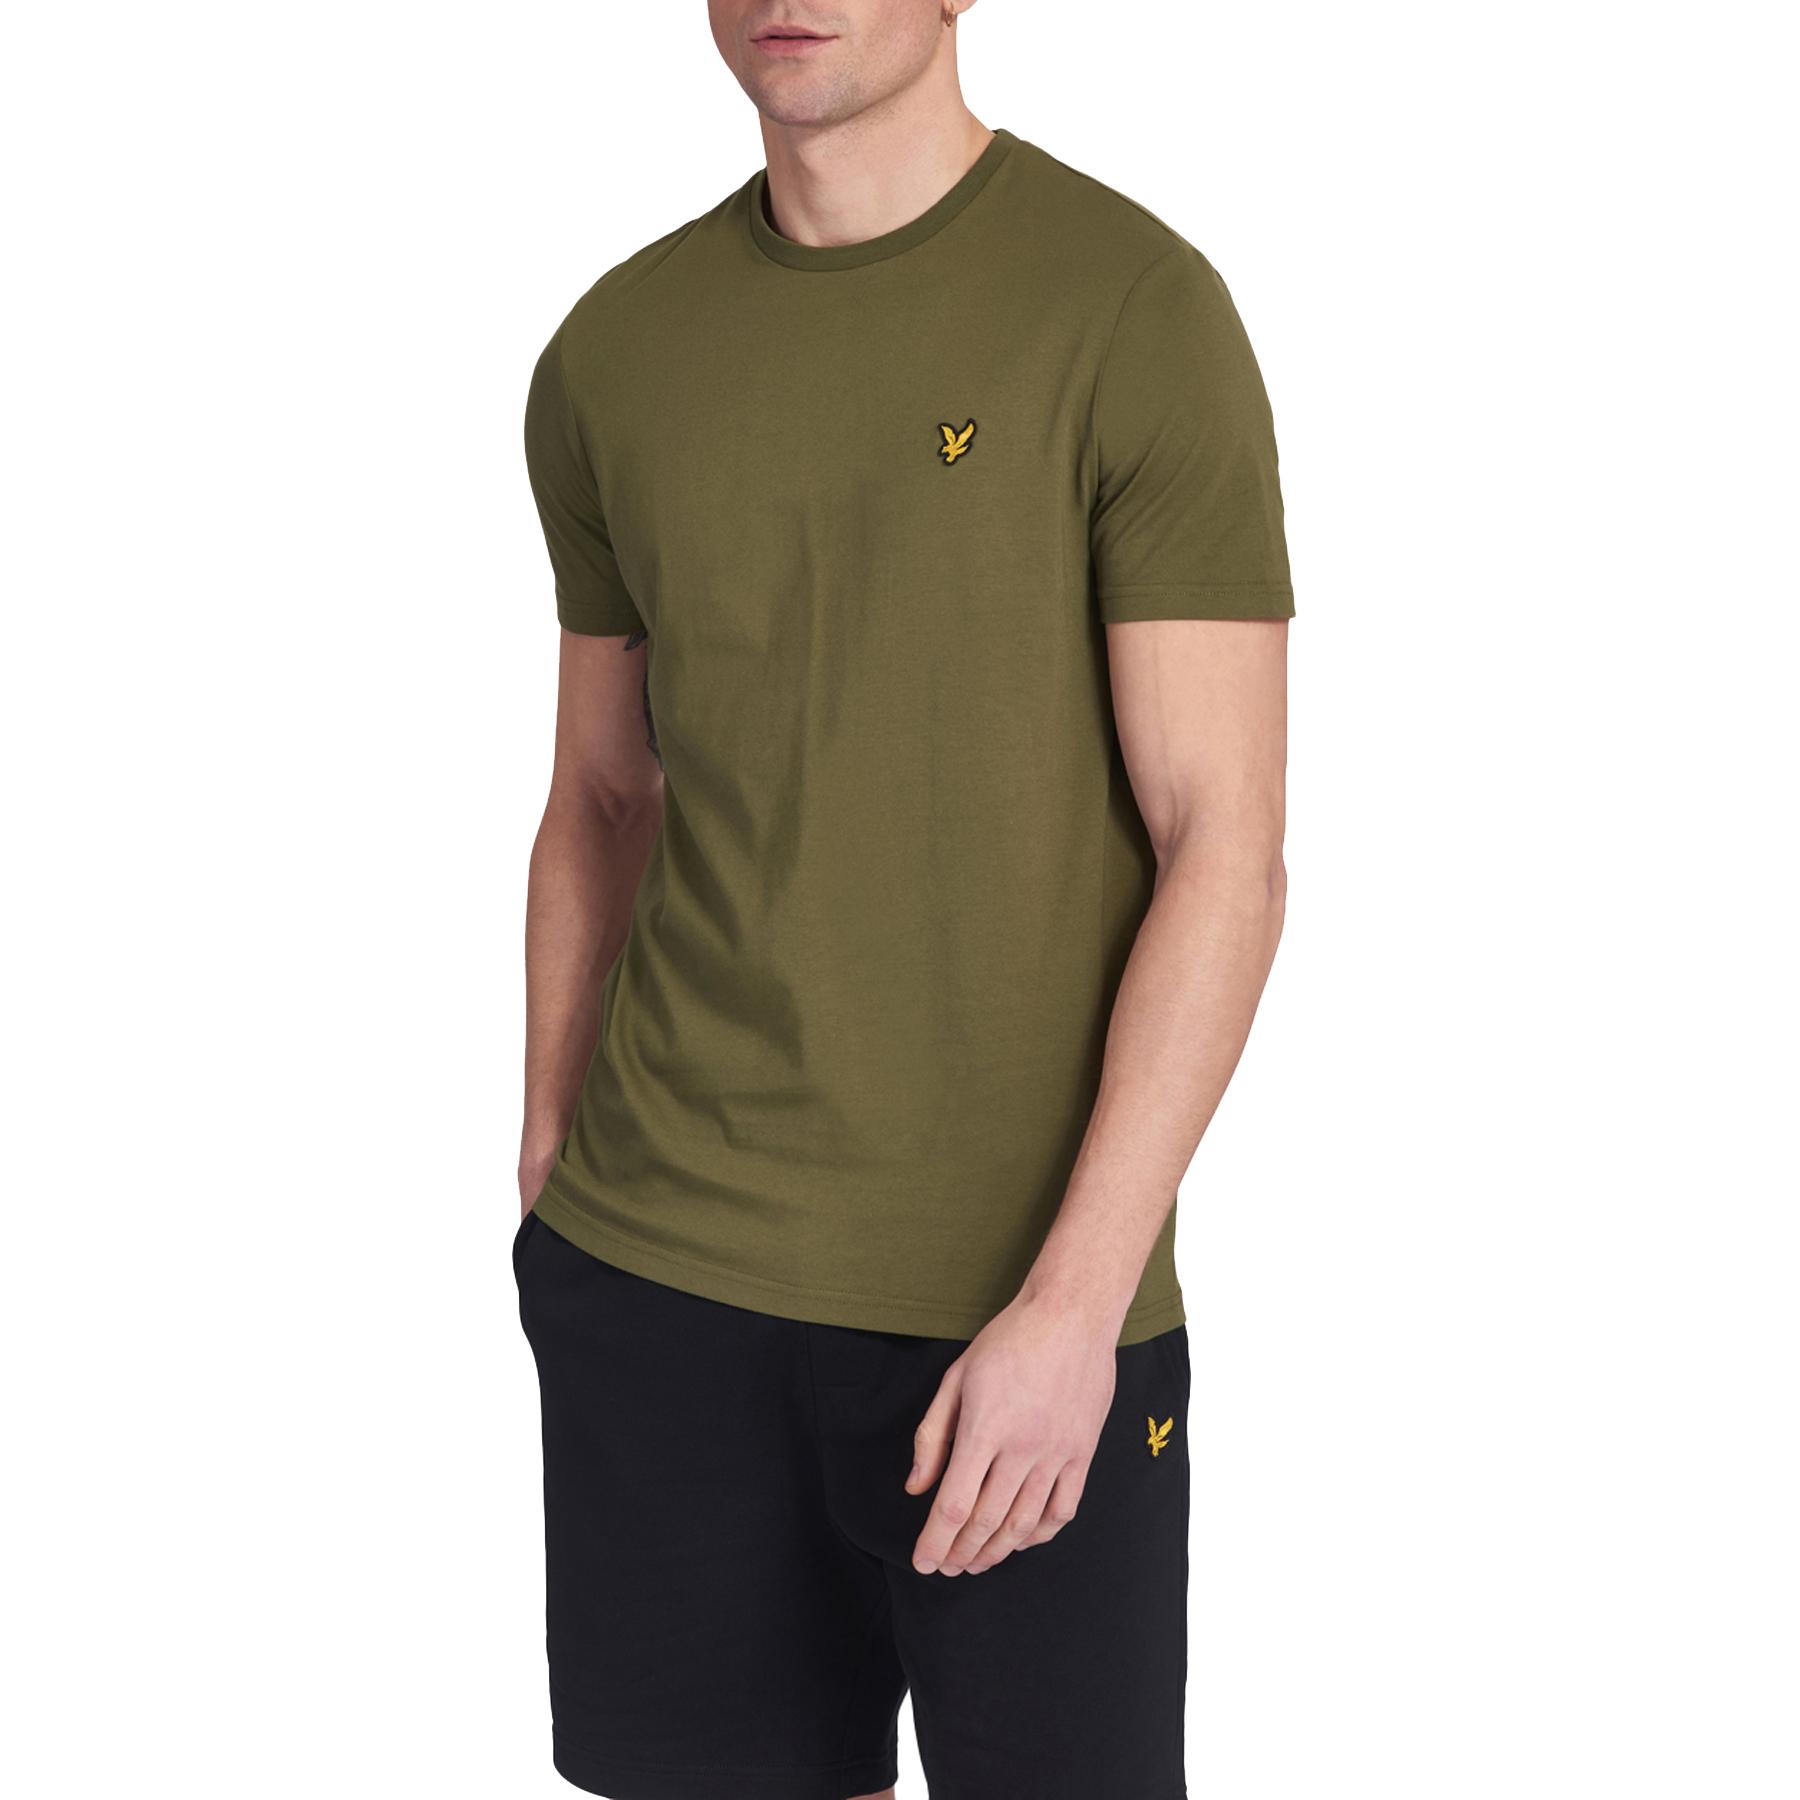 Green Lyle /& Scott Men/'s Crew T-Shirt